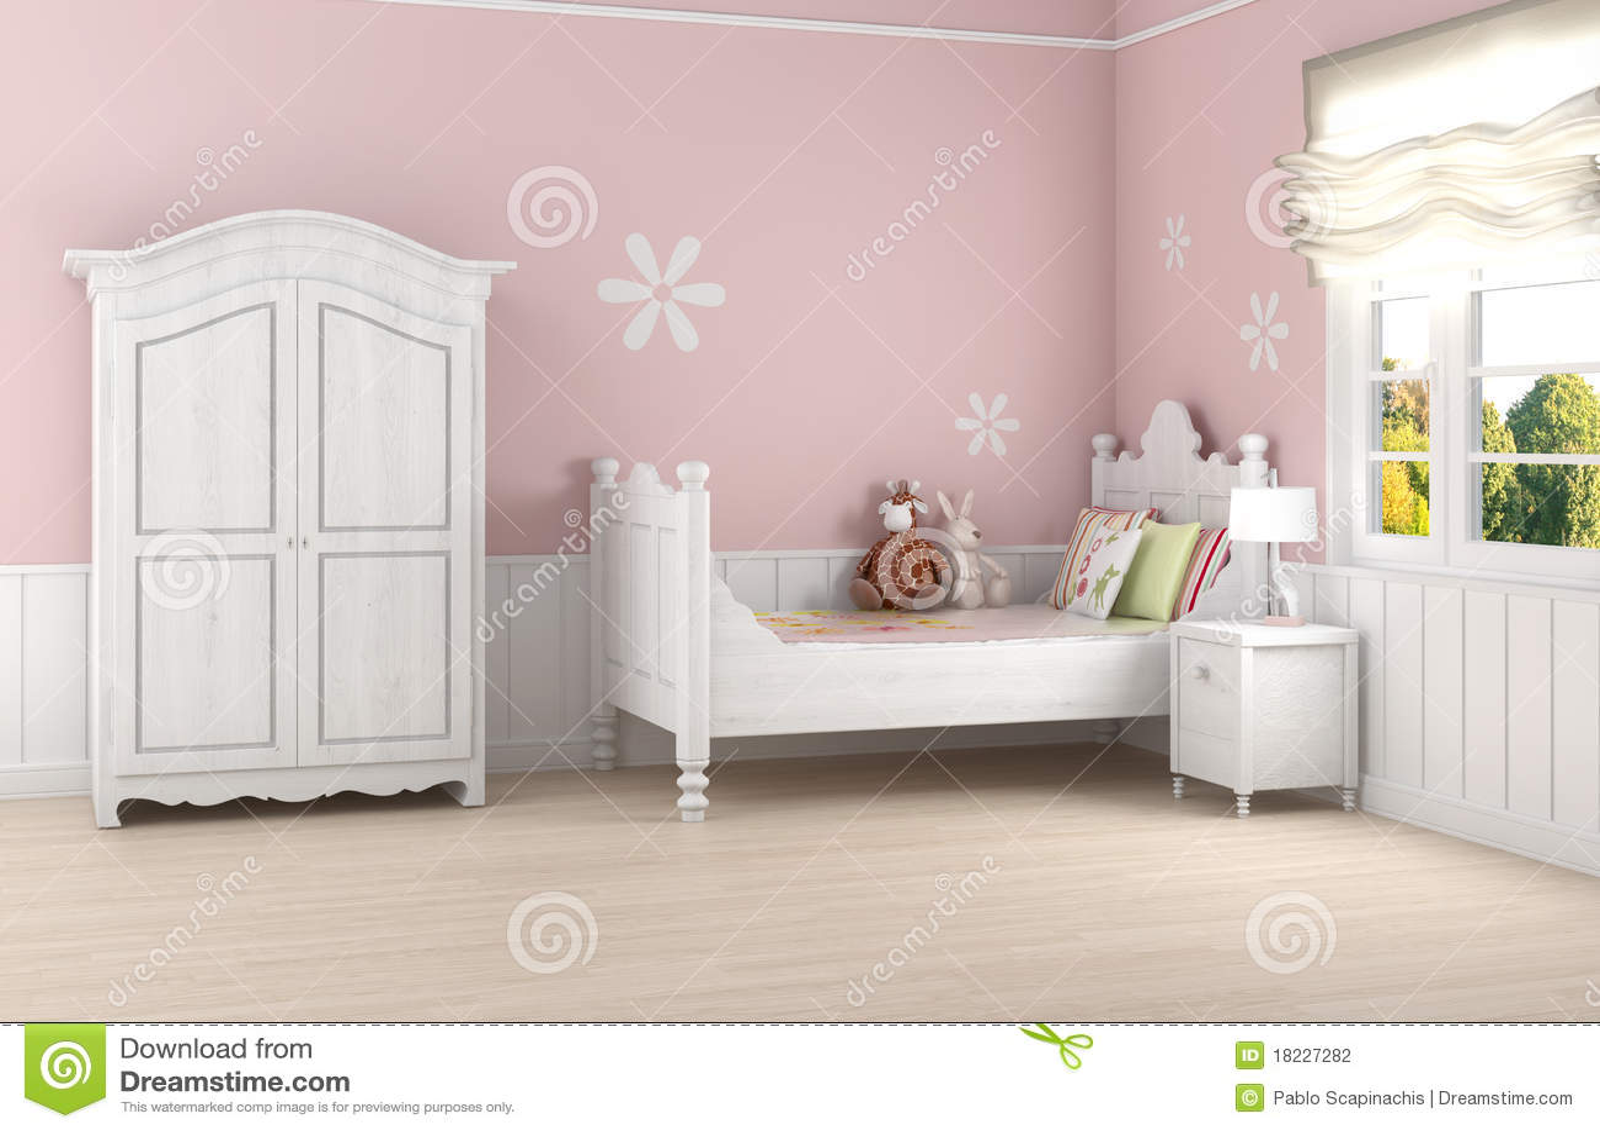 De slaapkamer van het roze meisje stock fotografie afbeelding 18227282 for Meisje slaapkamer fotos